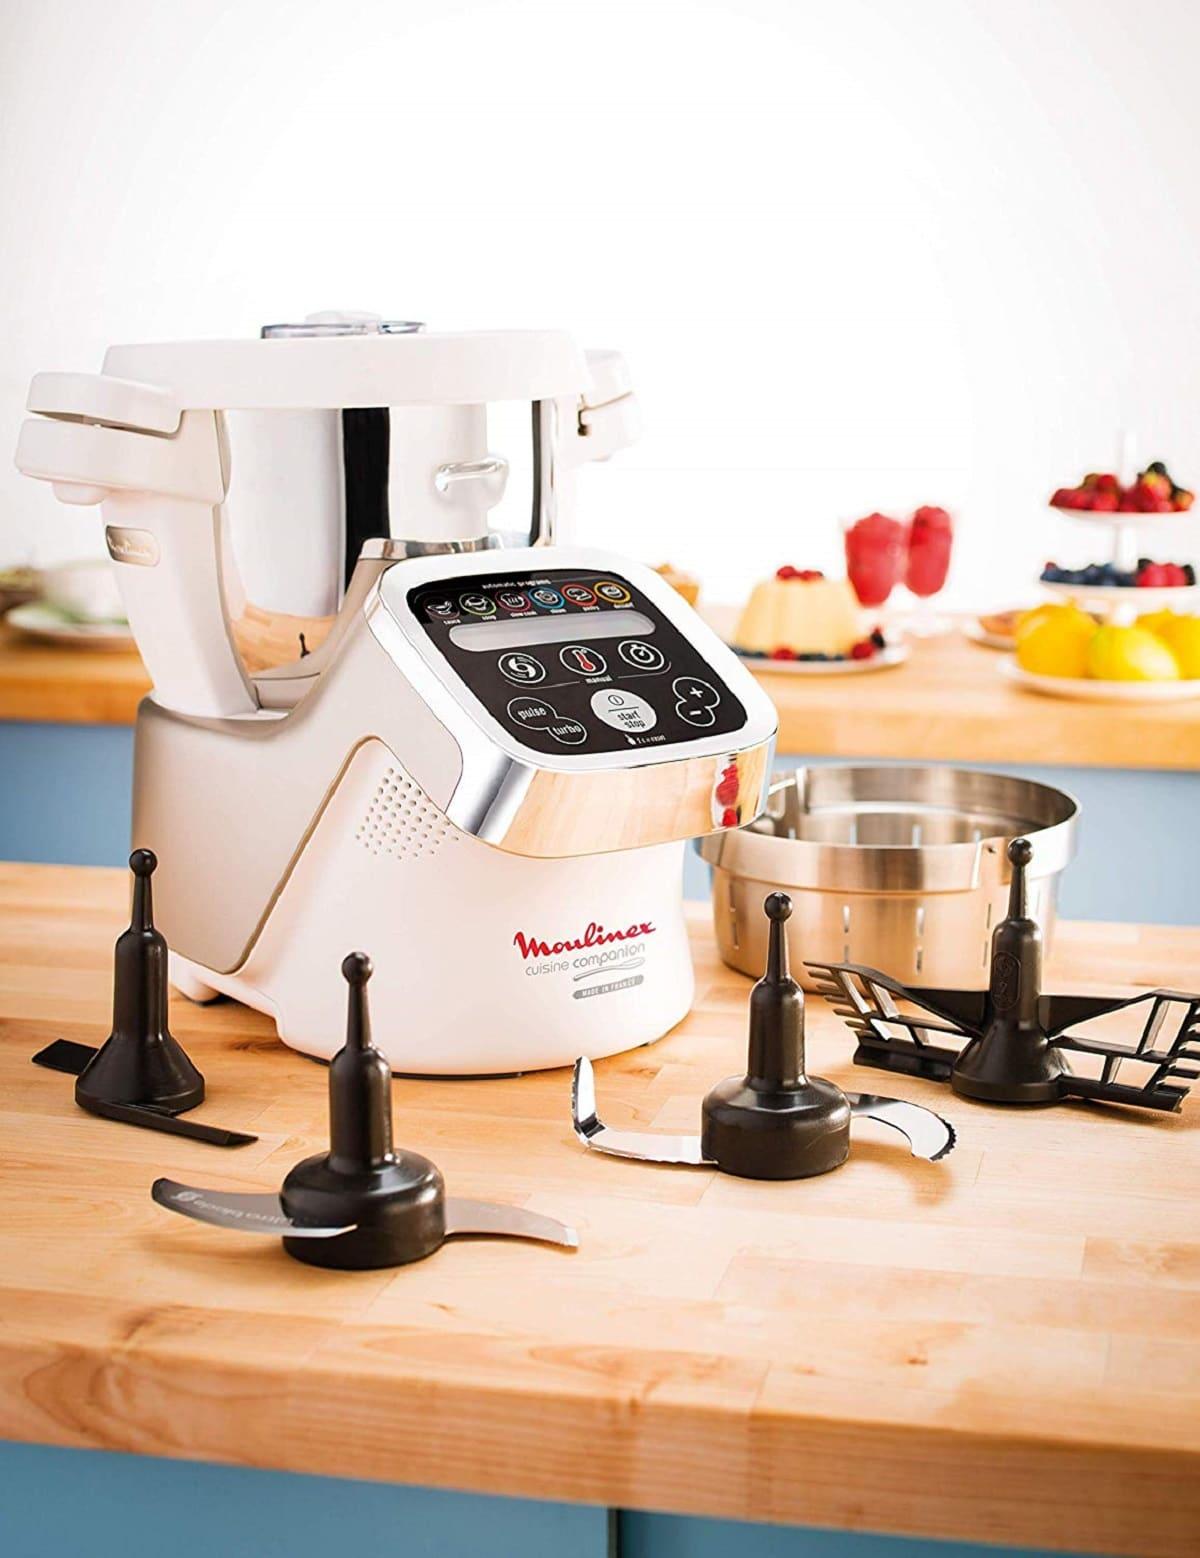 moulinex marca robot de cocina